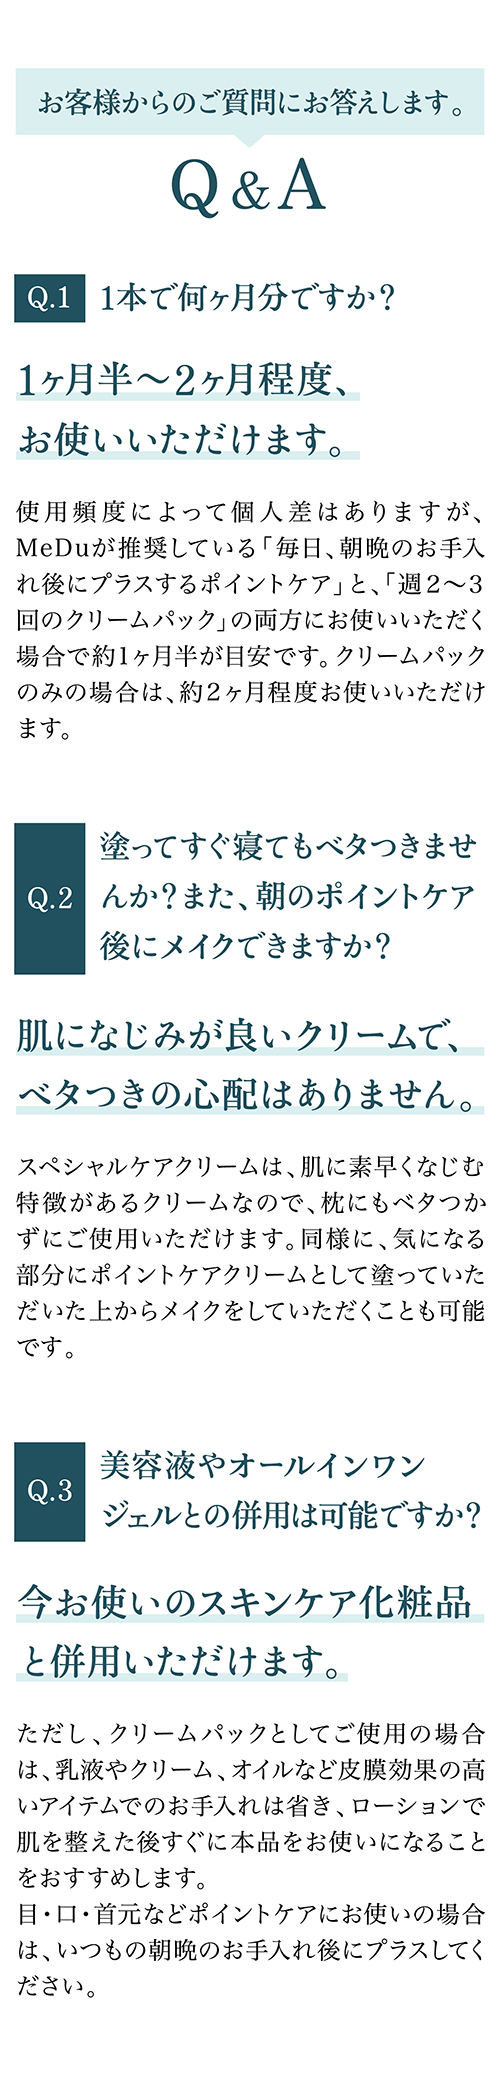 MeDu_store_online_w500_specialcare_16.jpg